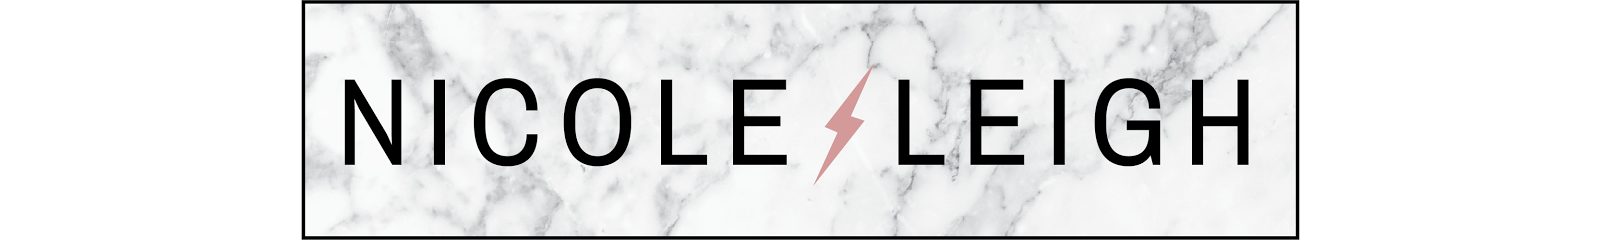 NICOLE LEIGH | LIFE ➕STYLE BLOG